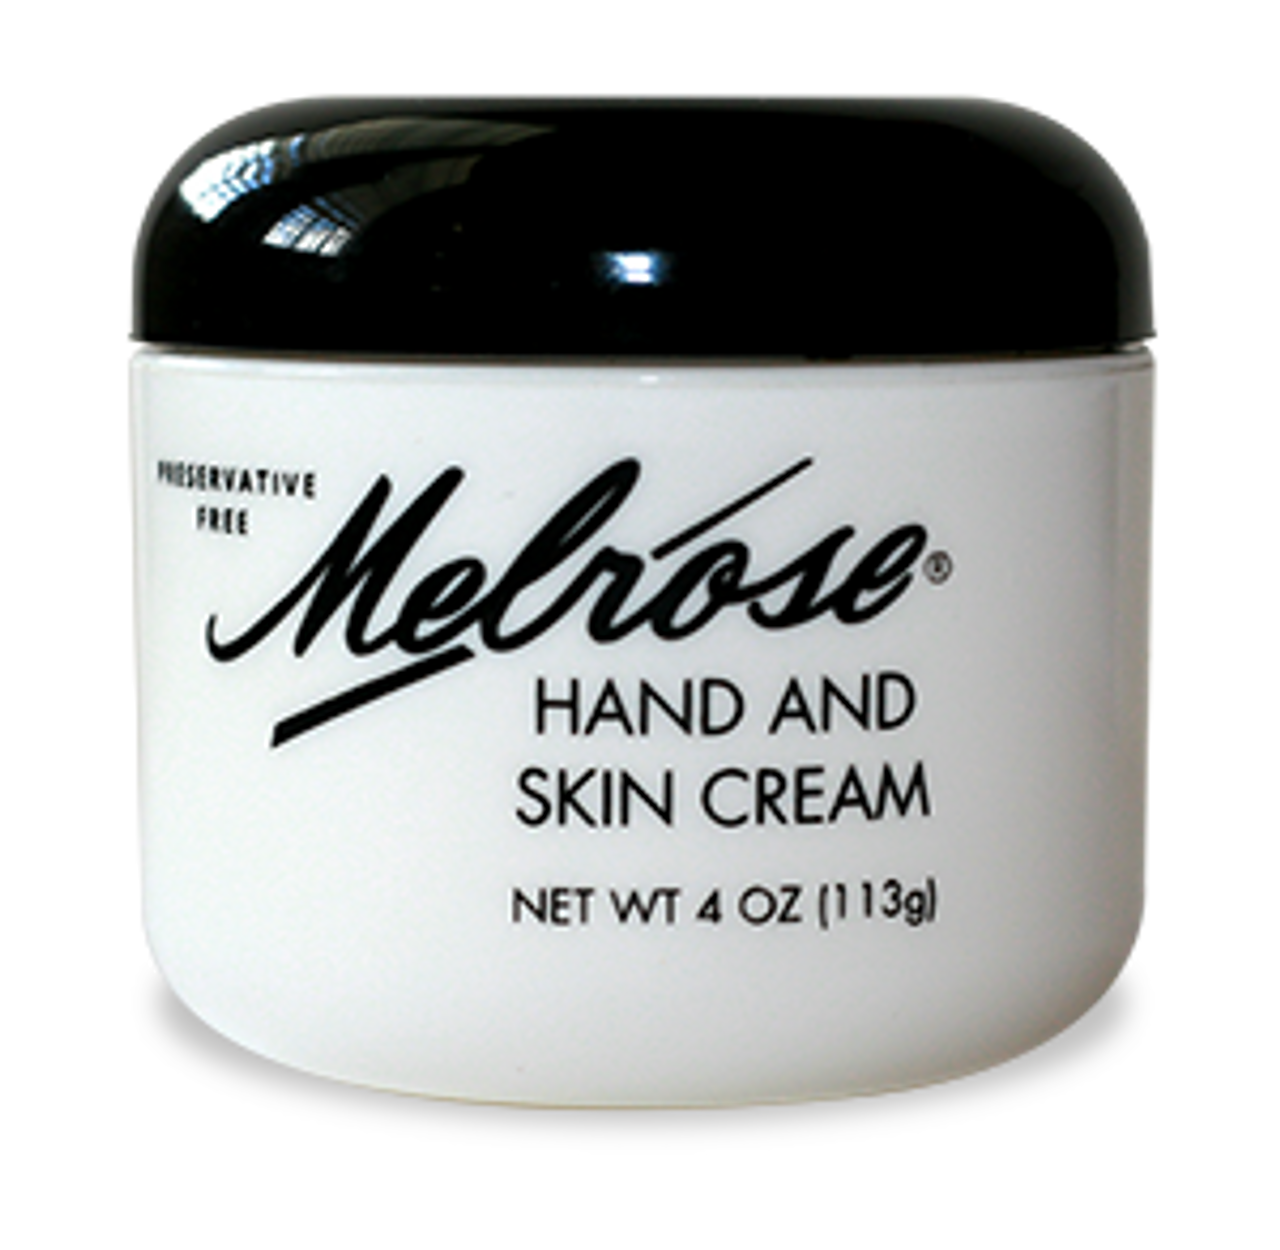 Melrose Hand and Skin Cream Jar